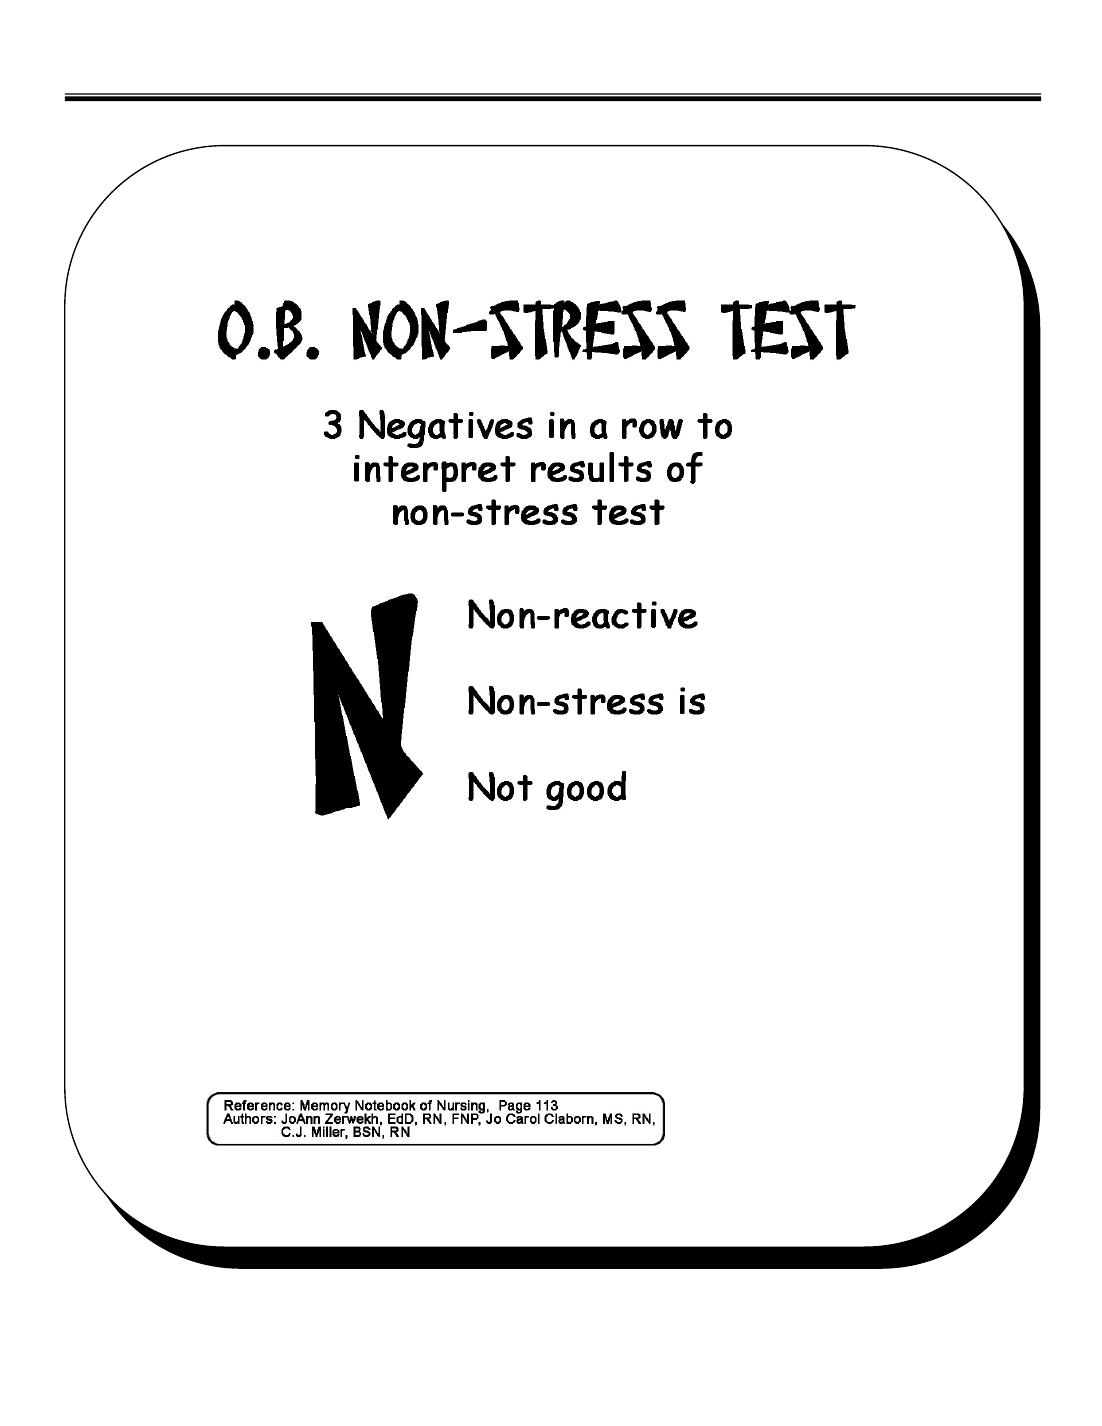 OB NON-STRESS Test - Stress PNG Pflege